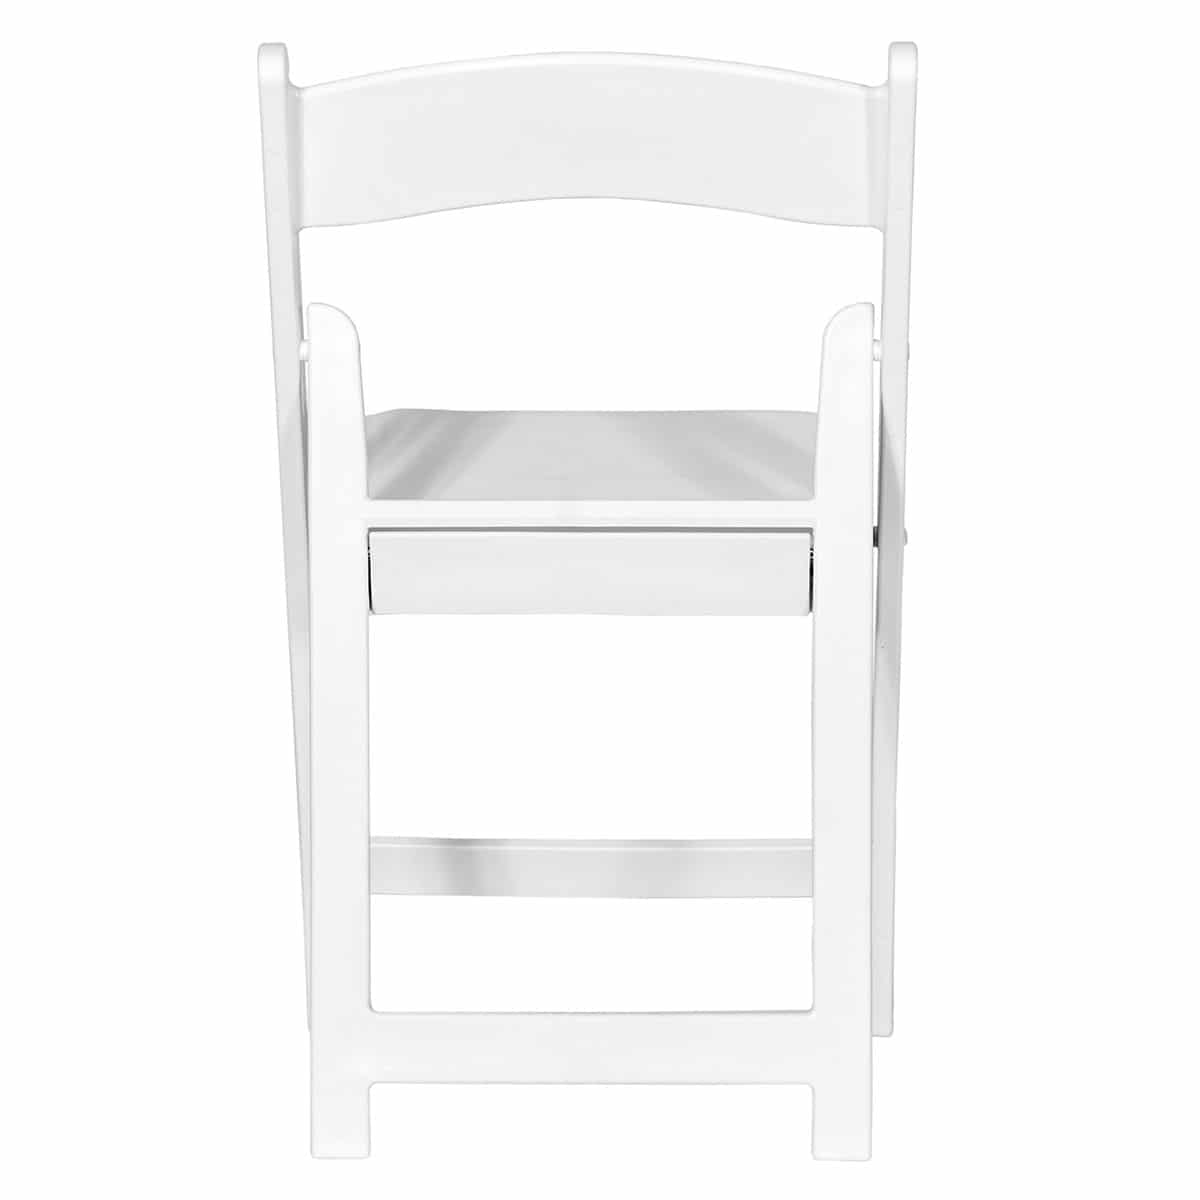 Economic white folding chair Sphinx model - Back view